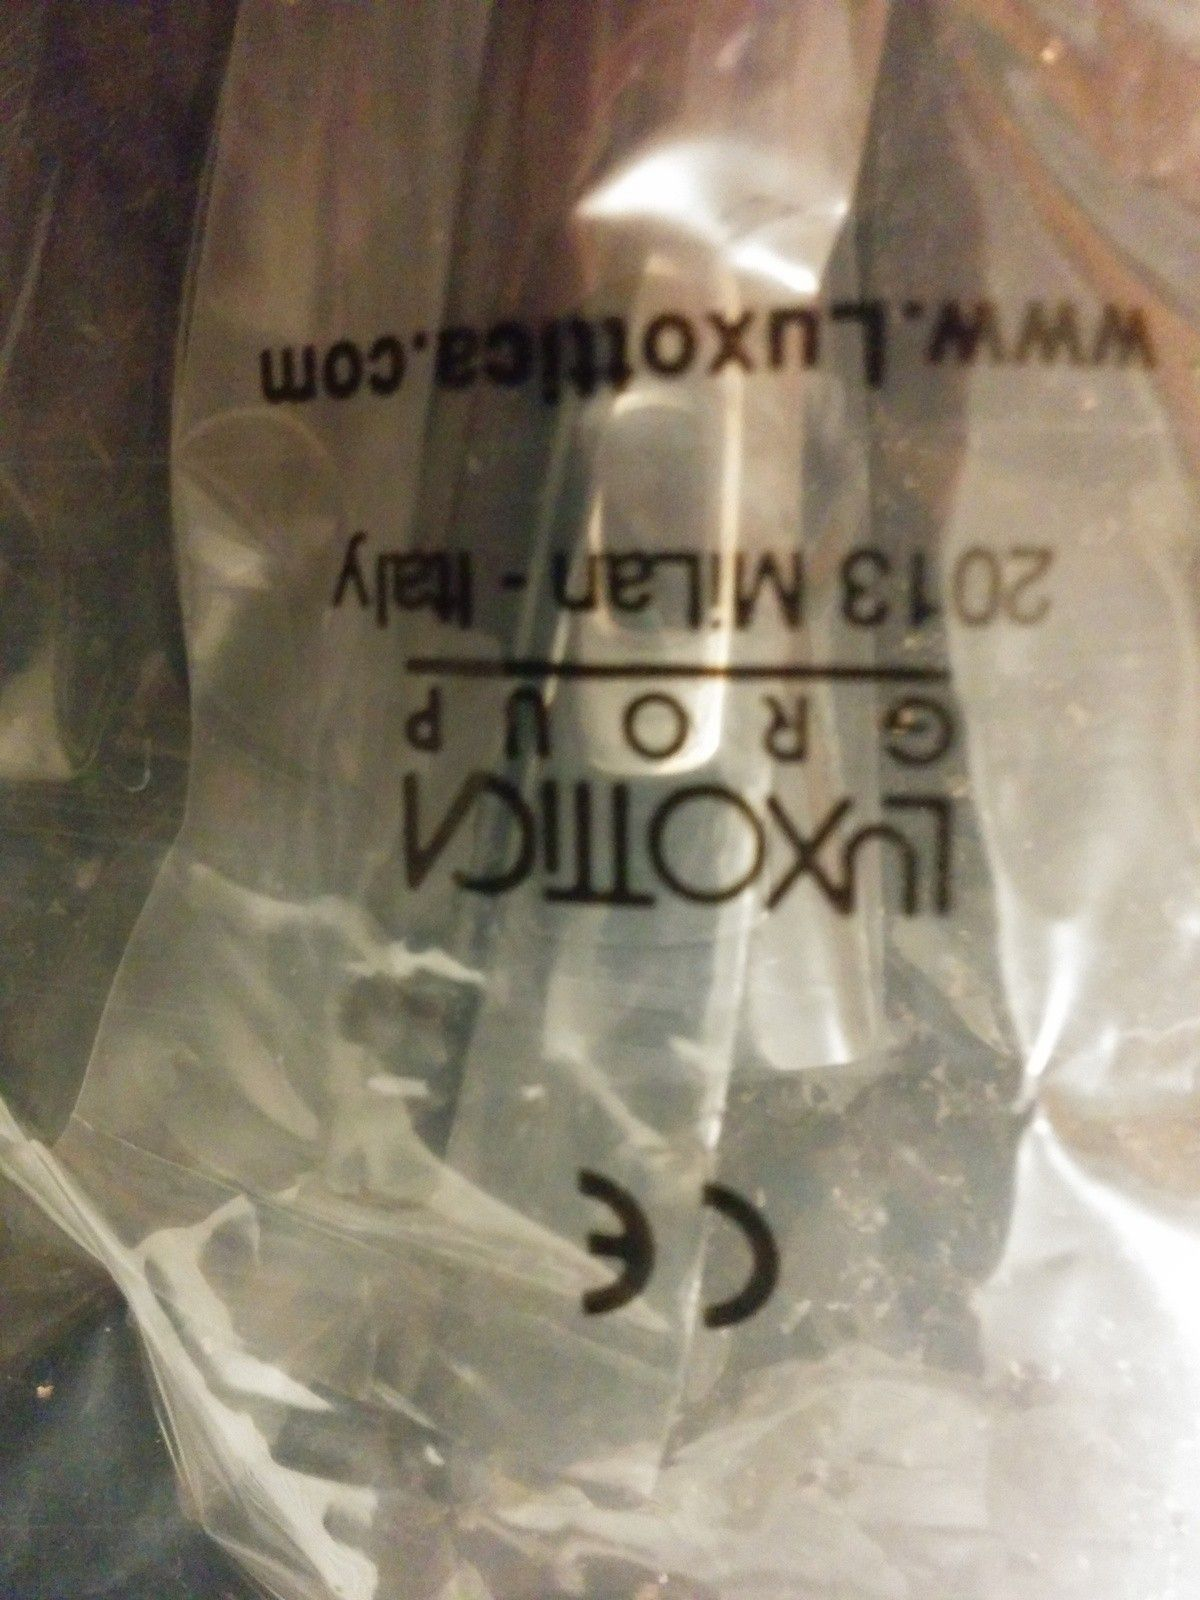 Oakley Carbon Plate Authenticity - uploadfromtaptalk1422076516016.jpg